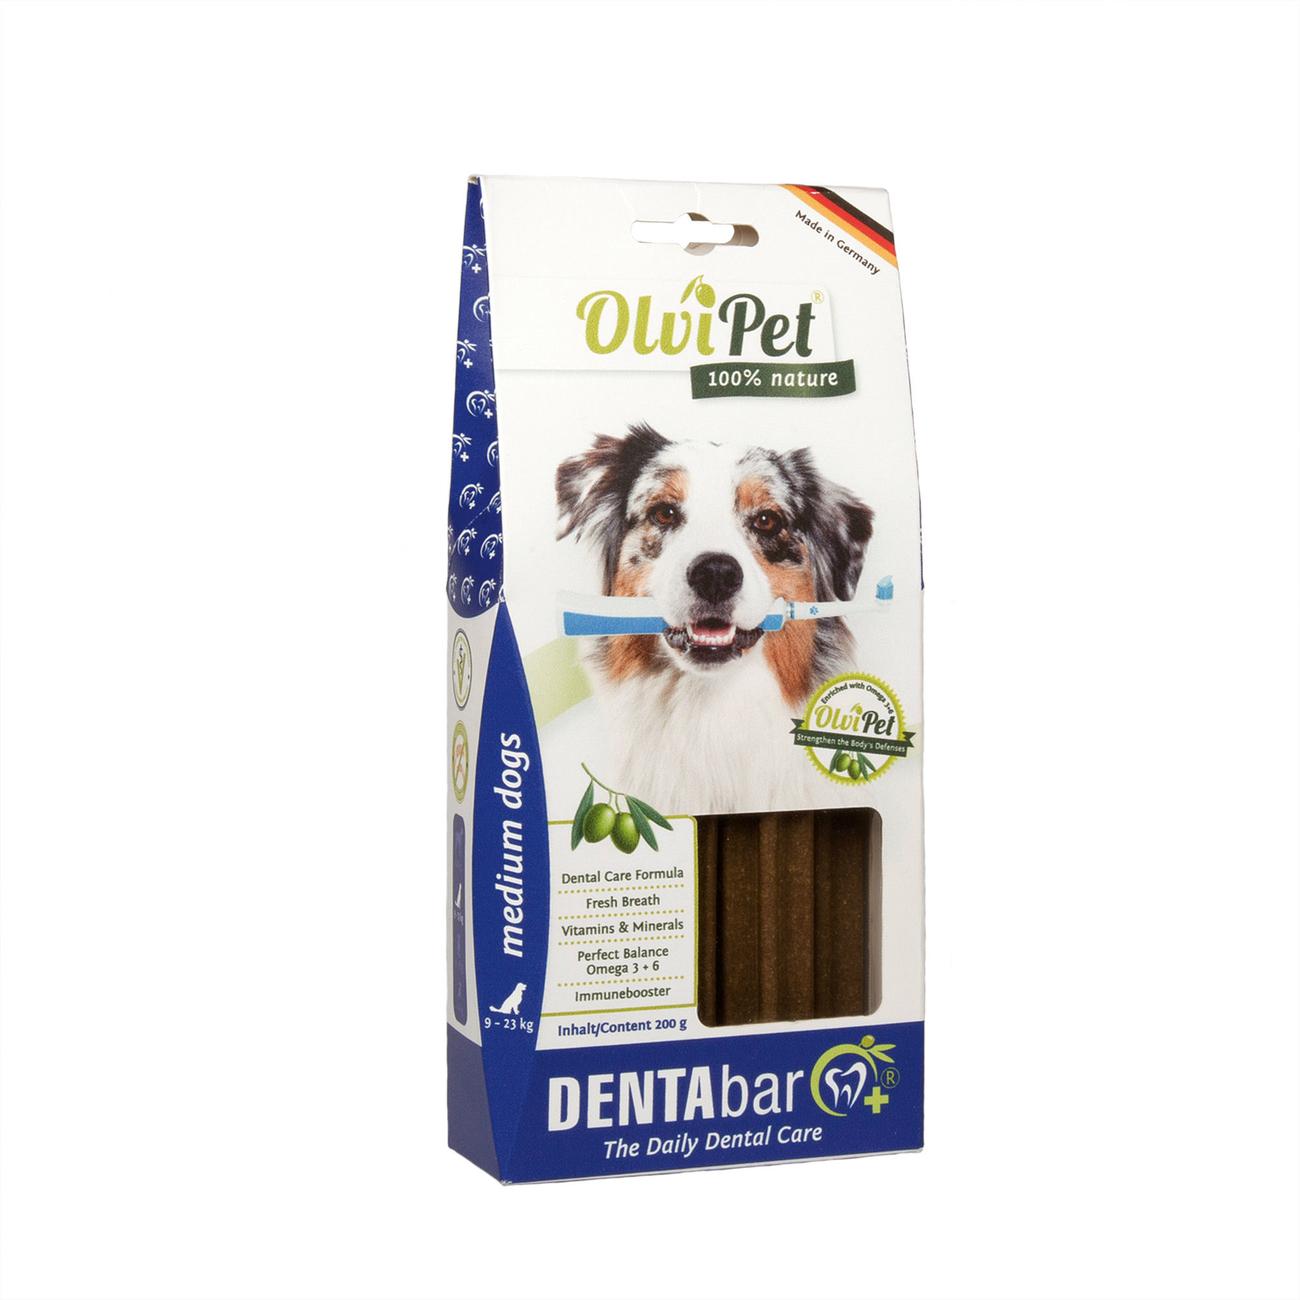 OlviPet DentaBar für Hunde, Bild 2